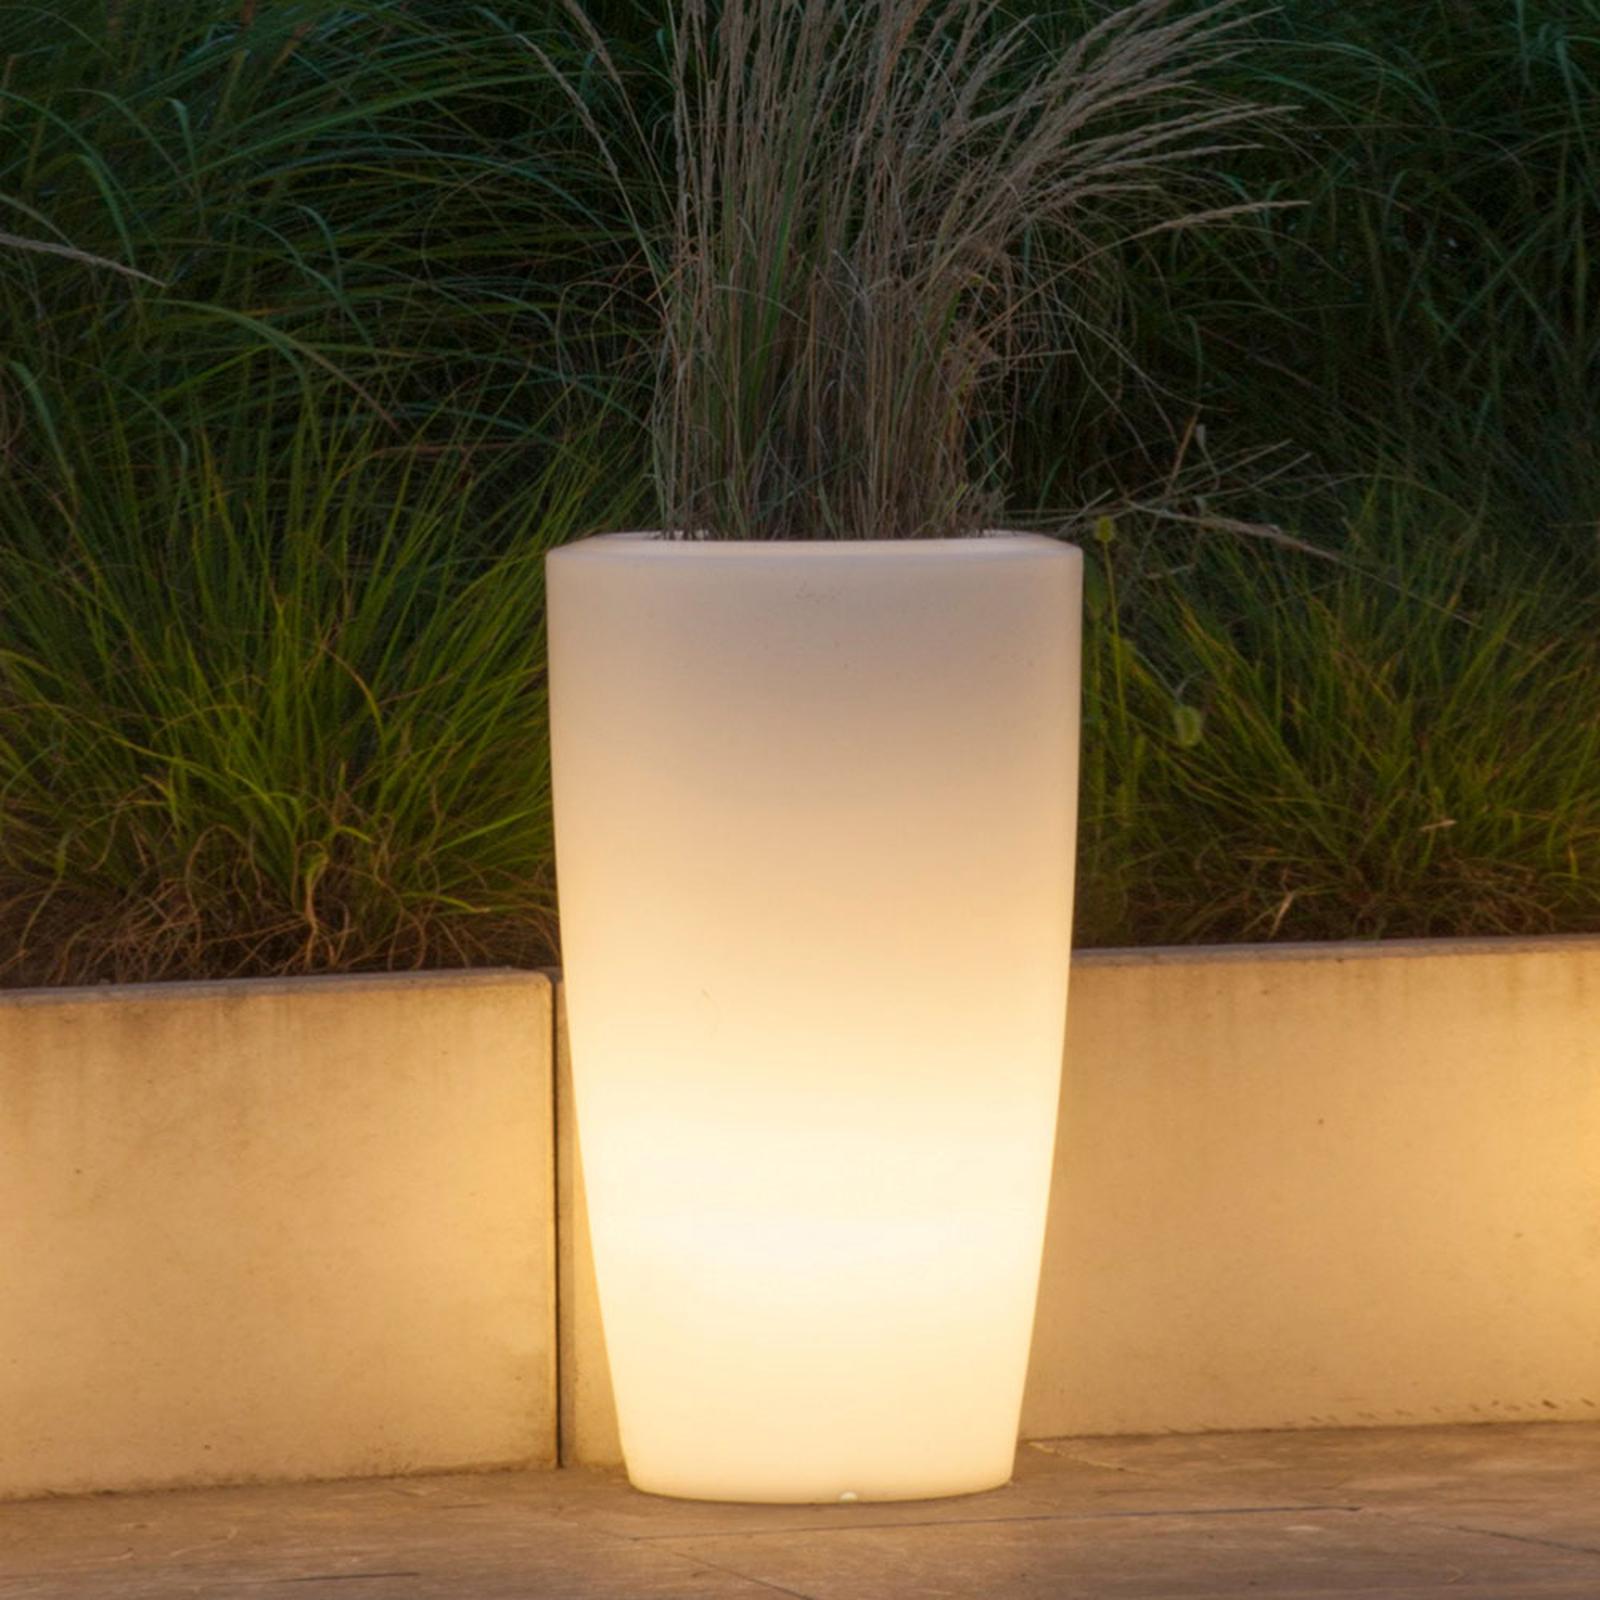 Lampa dekoracyjna Rovio III donica, biała